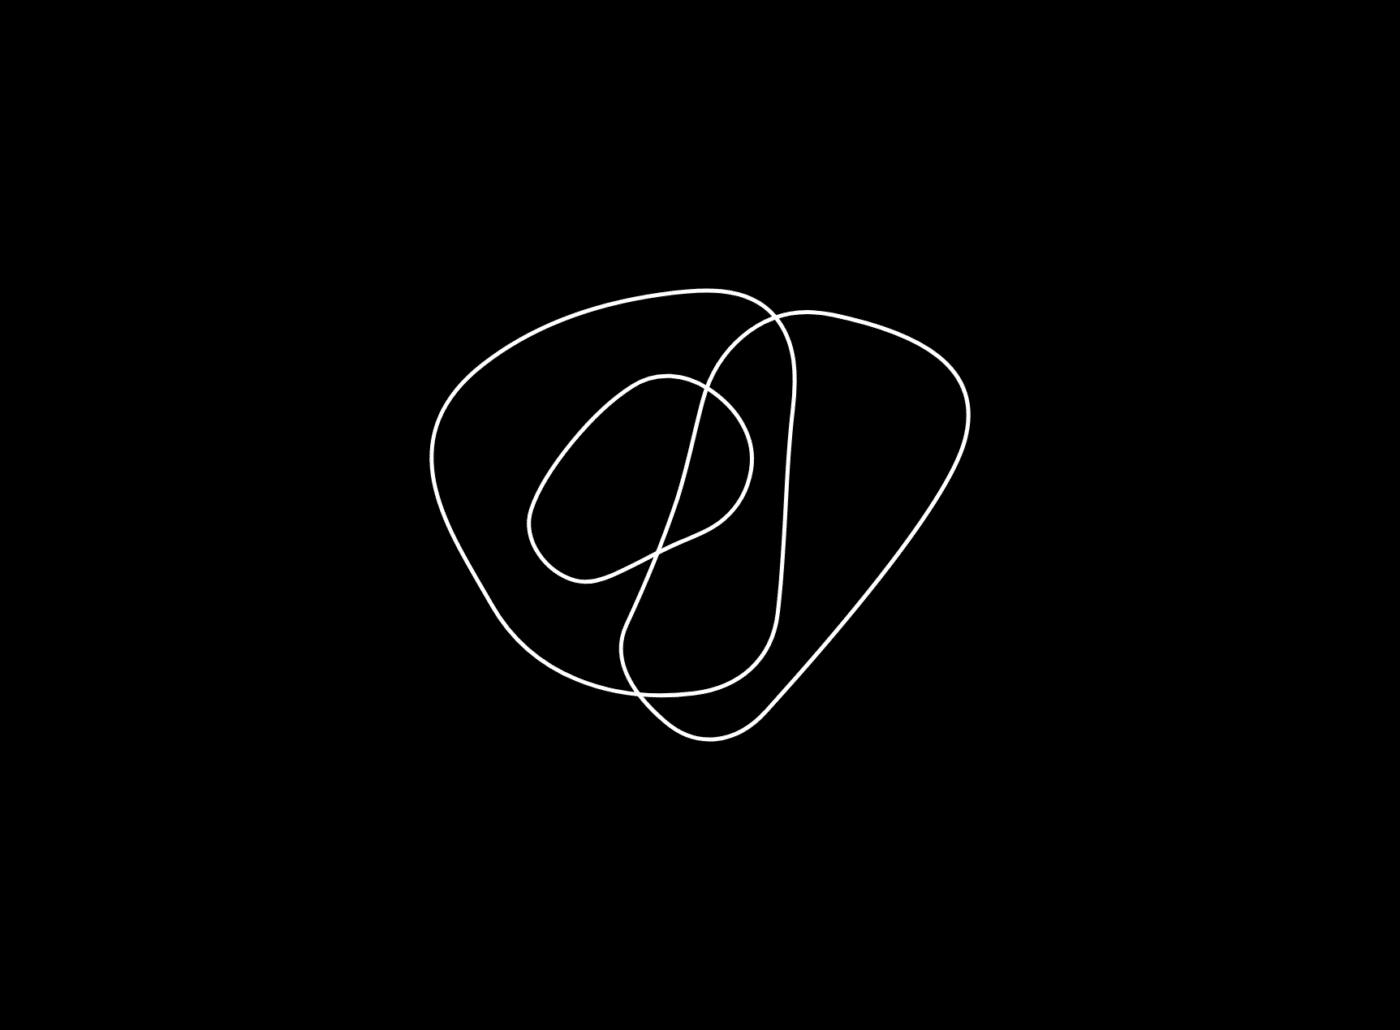 Sobremesa identity designed by TAC